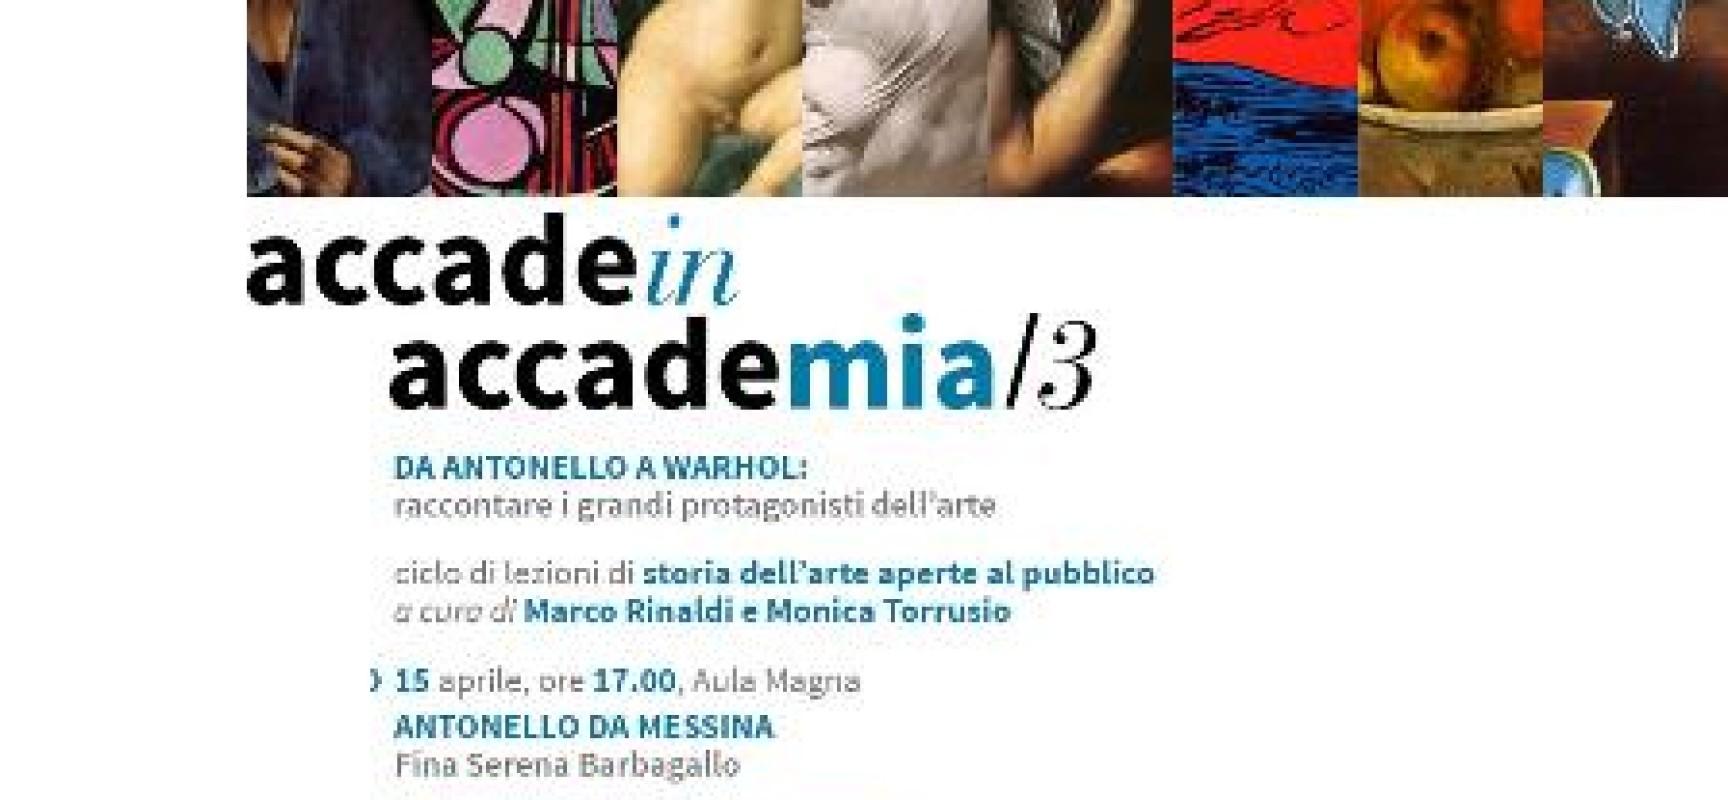 af84705729f Accademia Belle Arti